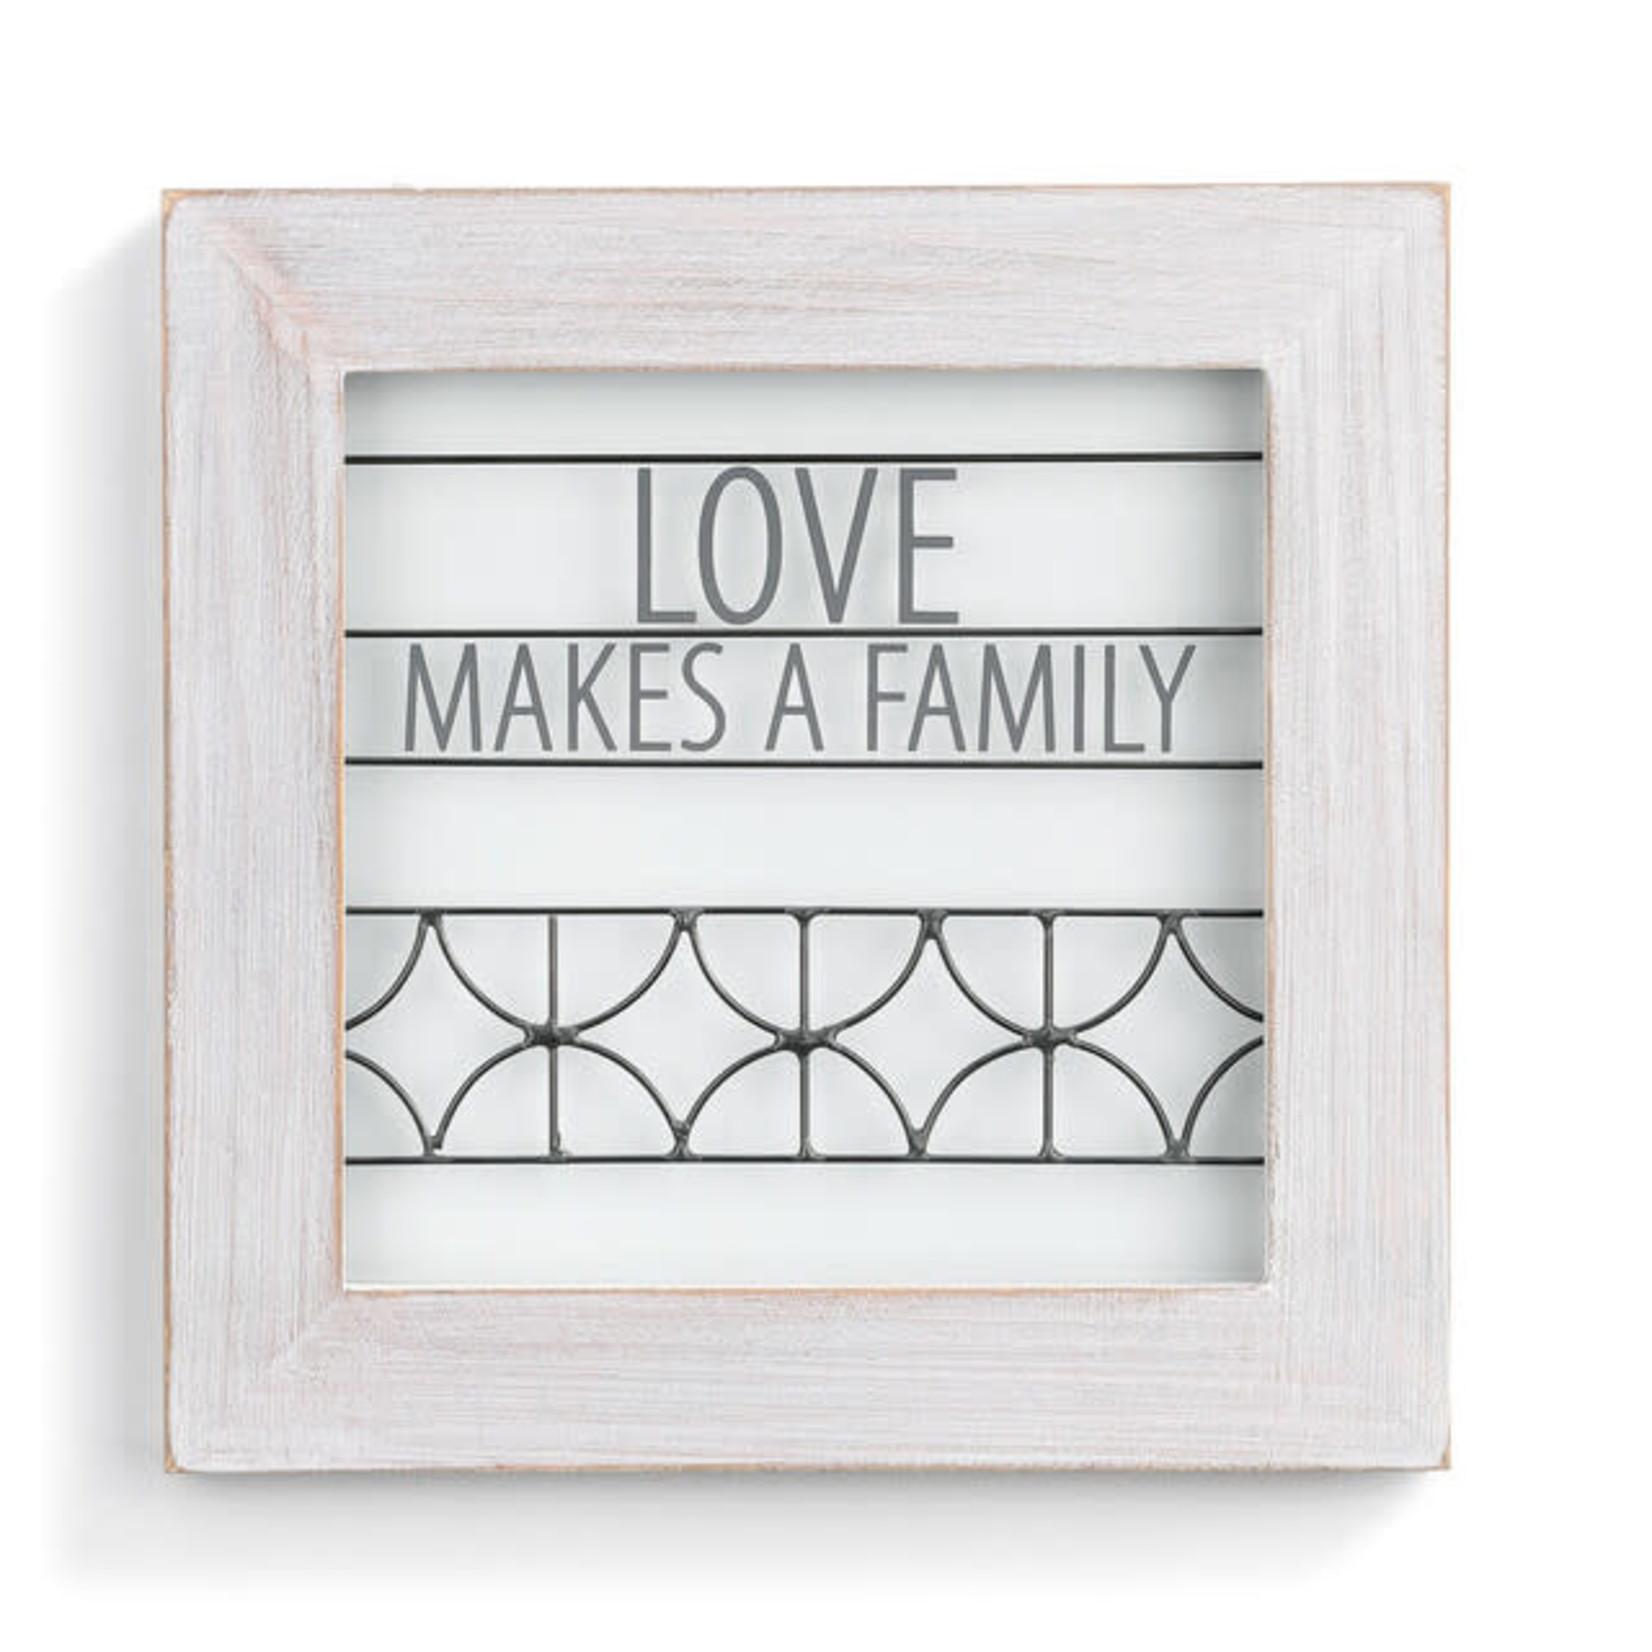 LOVE MAKES A FAMILY WALL DECOR